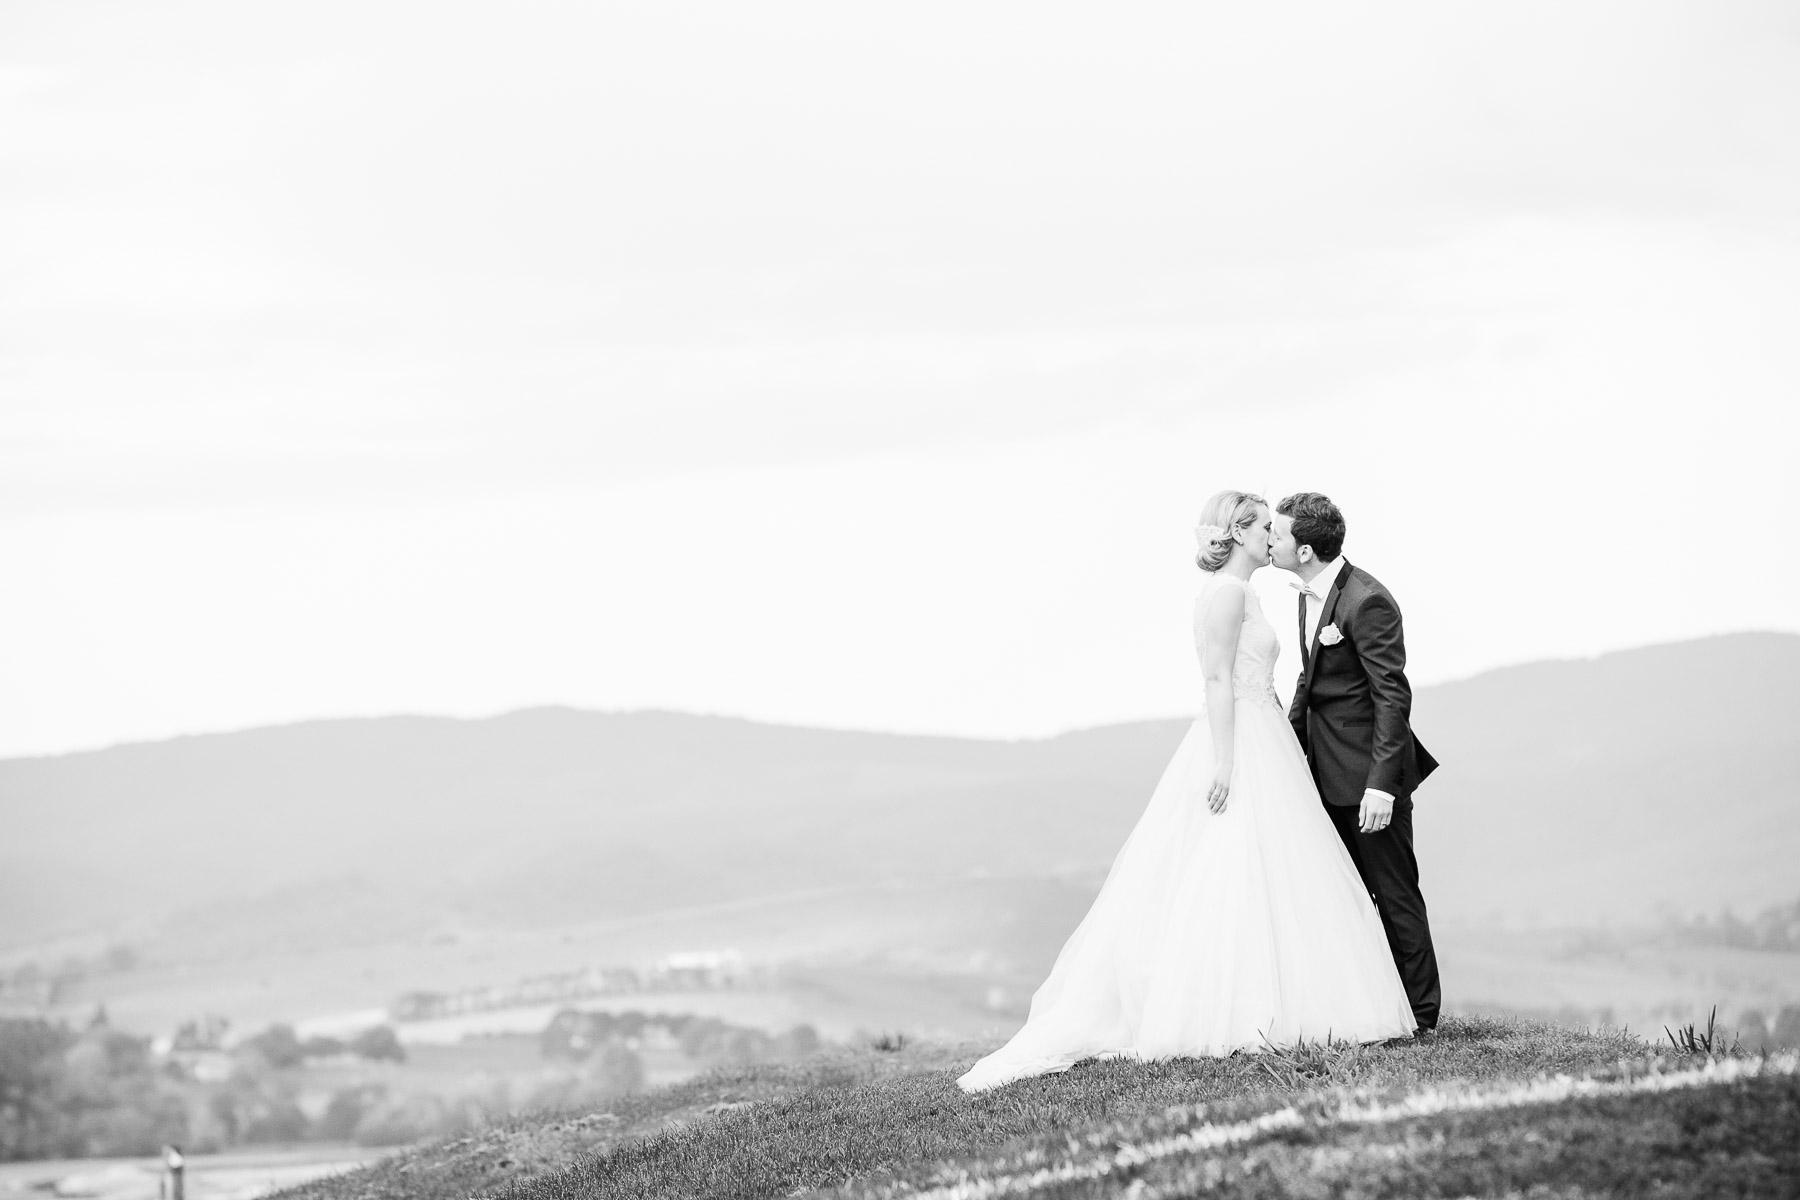 Marnie_and_Charlie_Yarra_Valley_Wedding_Blog-72.jpg